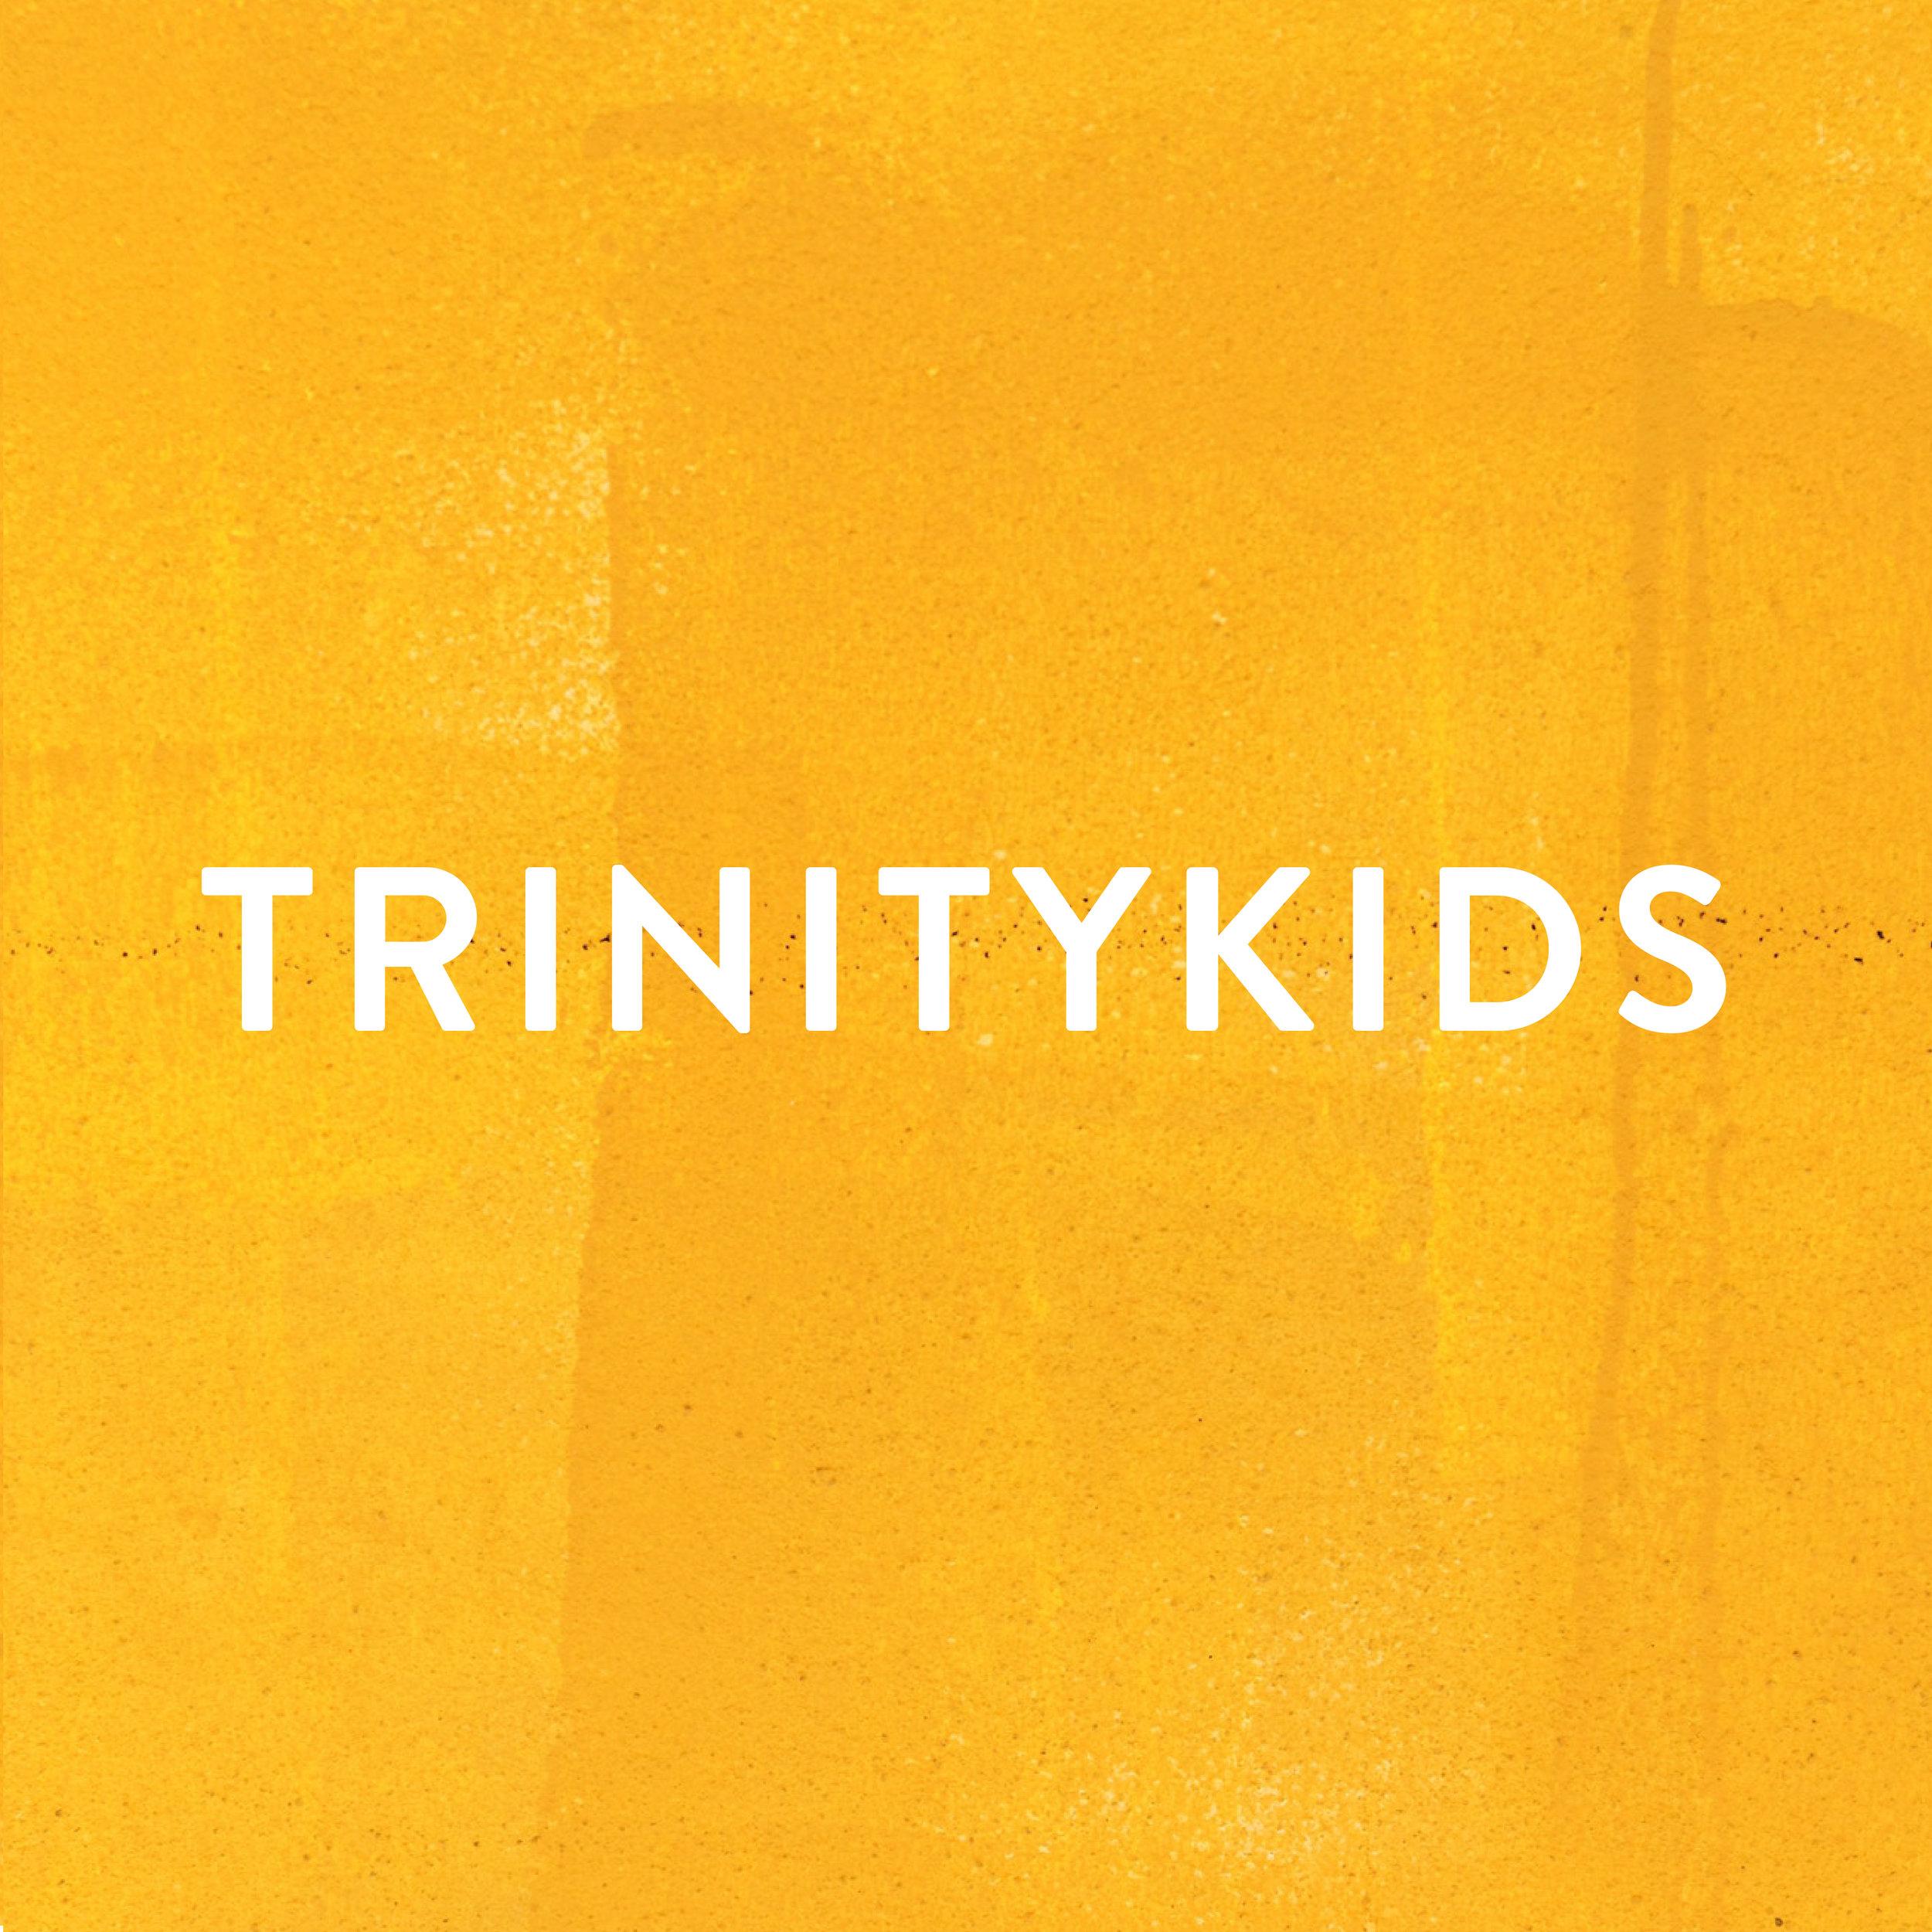 trinity kids.jpg